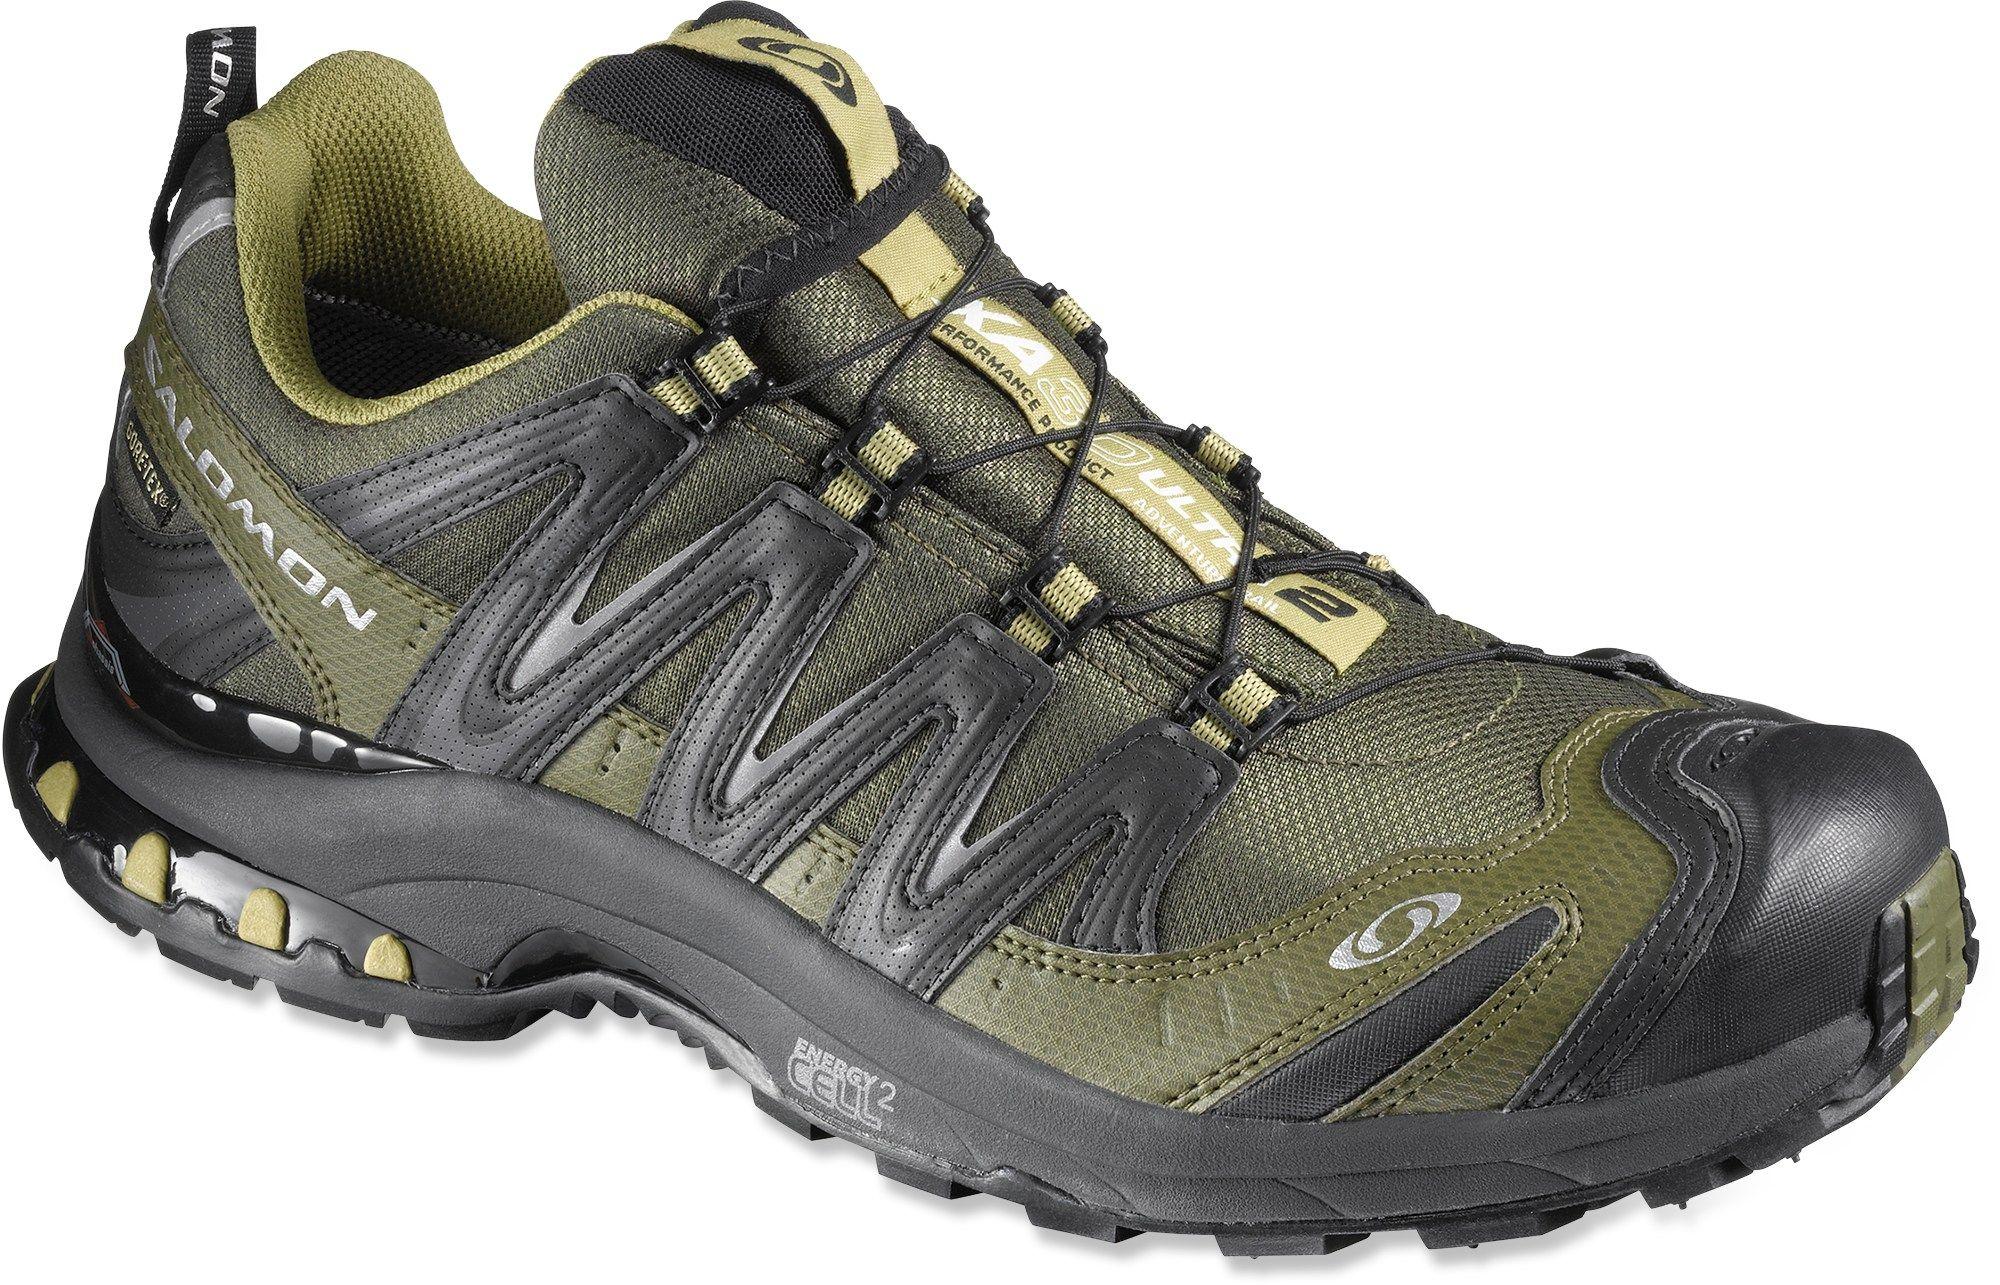 la meilleure attitude 4d7bd e45eb Salomon XA Pro 3D Ultra 2 GTX Trail-Running Shoes - Men's ...